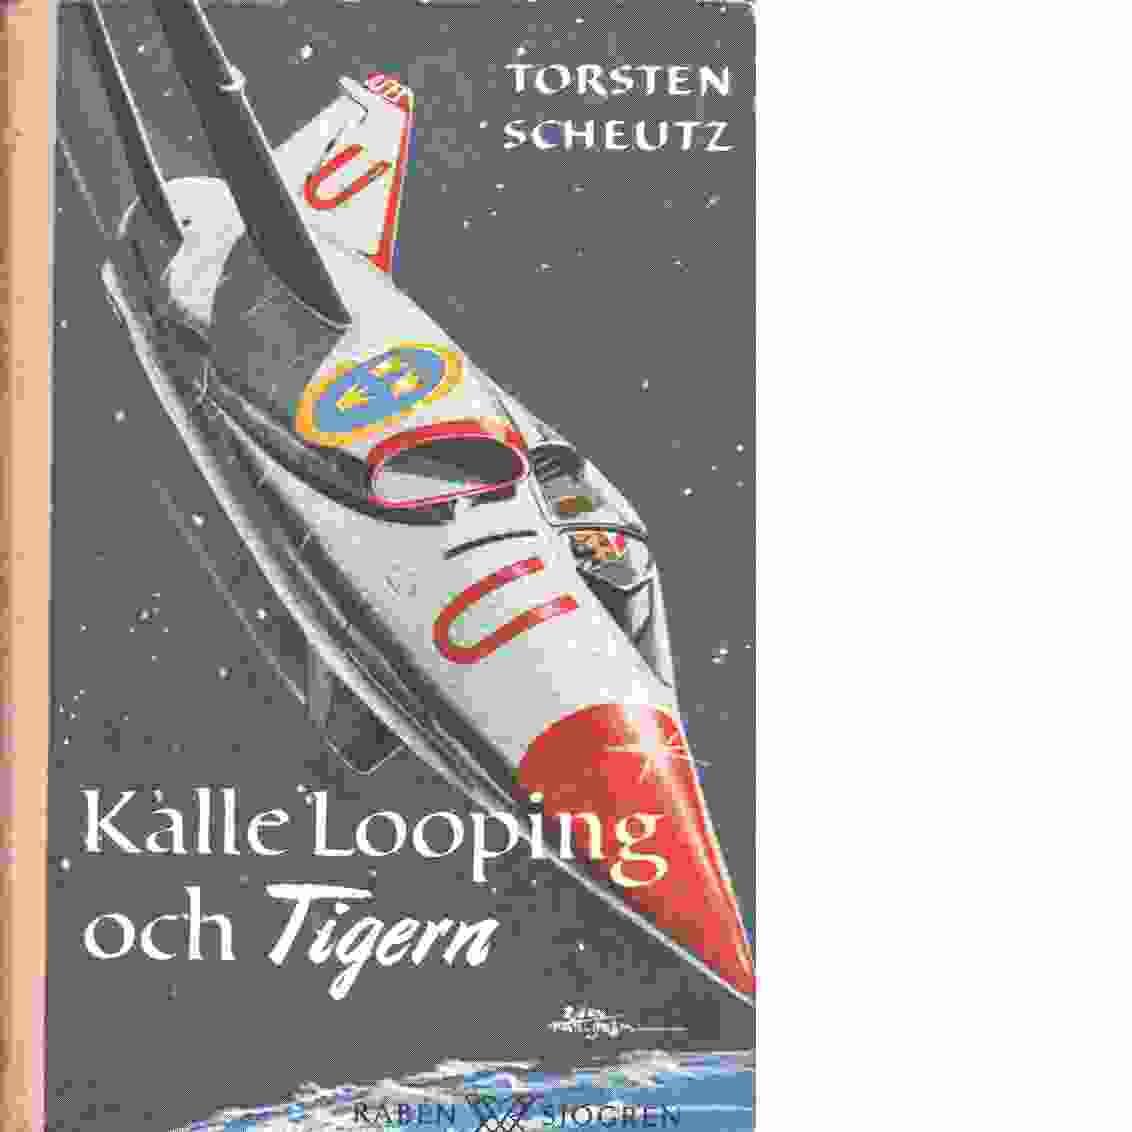 Kalle Looping och Tigern - Scheutz, Torsten